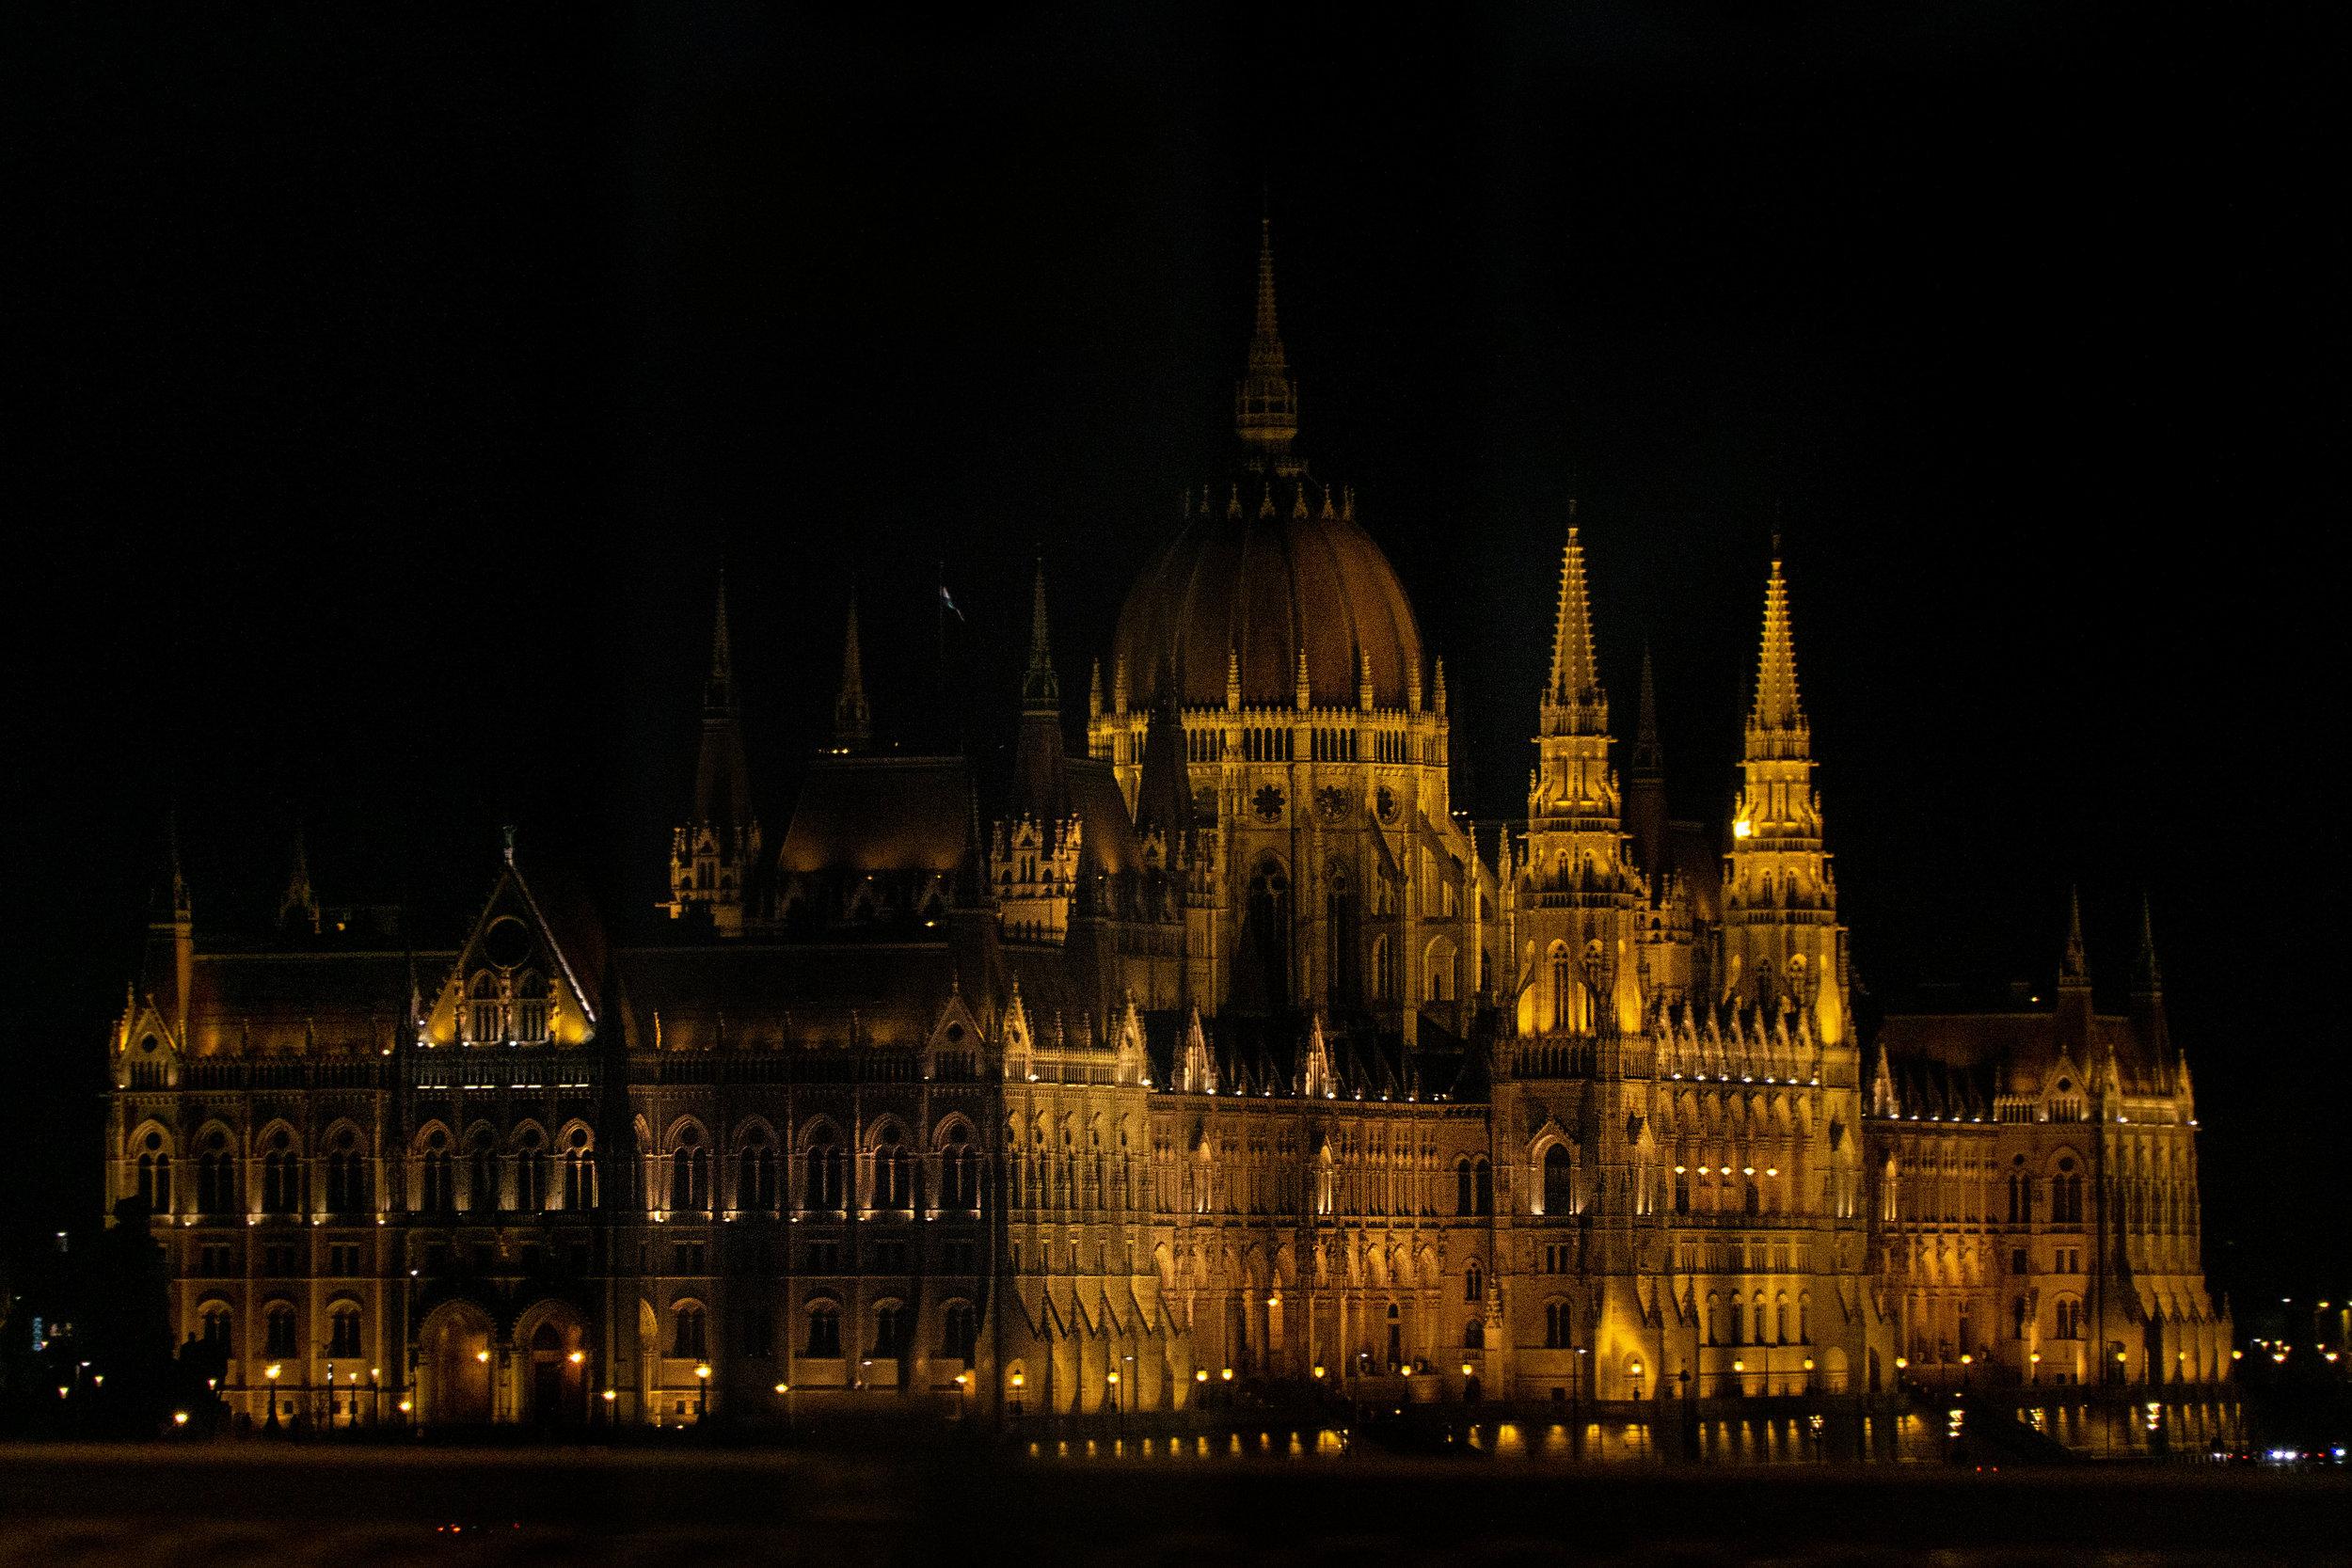 budapest_parliament_building_vickygood_travel_photography2.smjpg.jpg